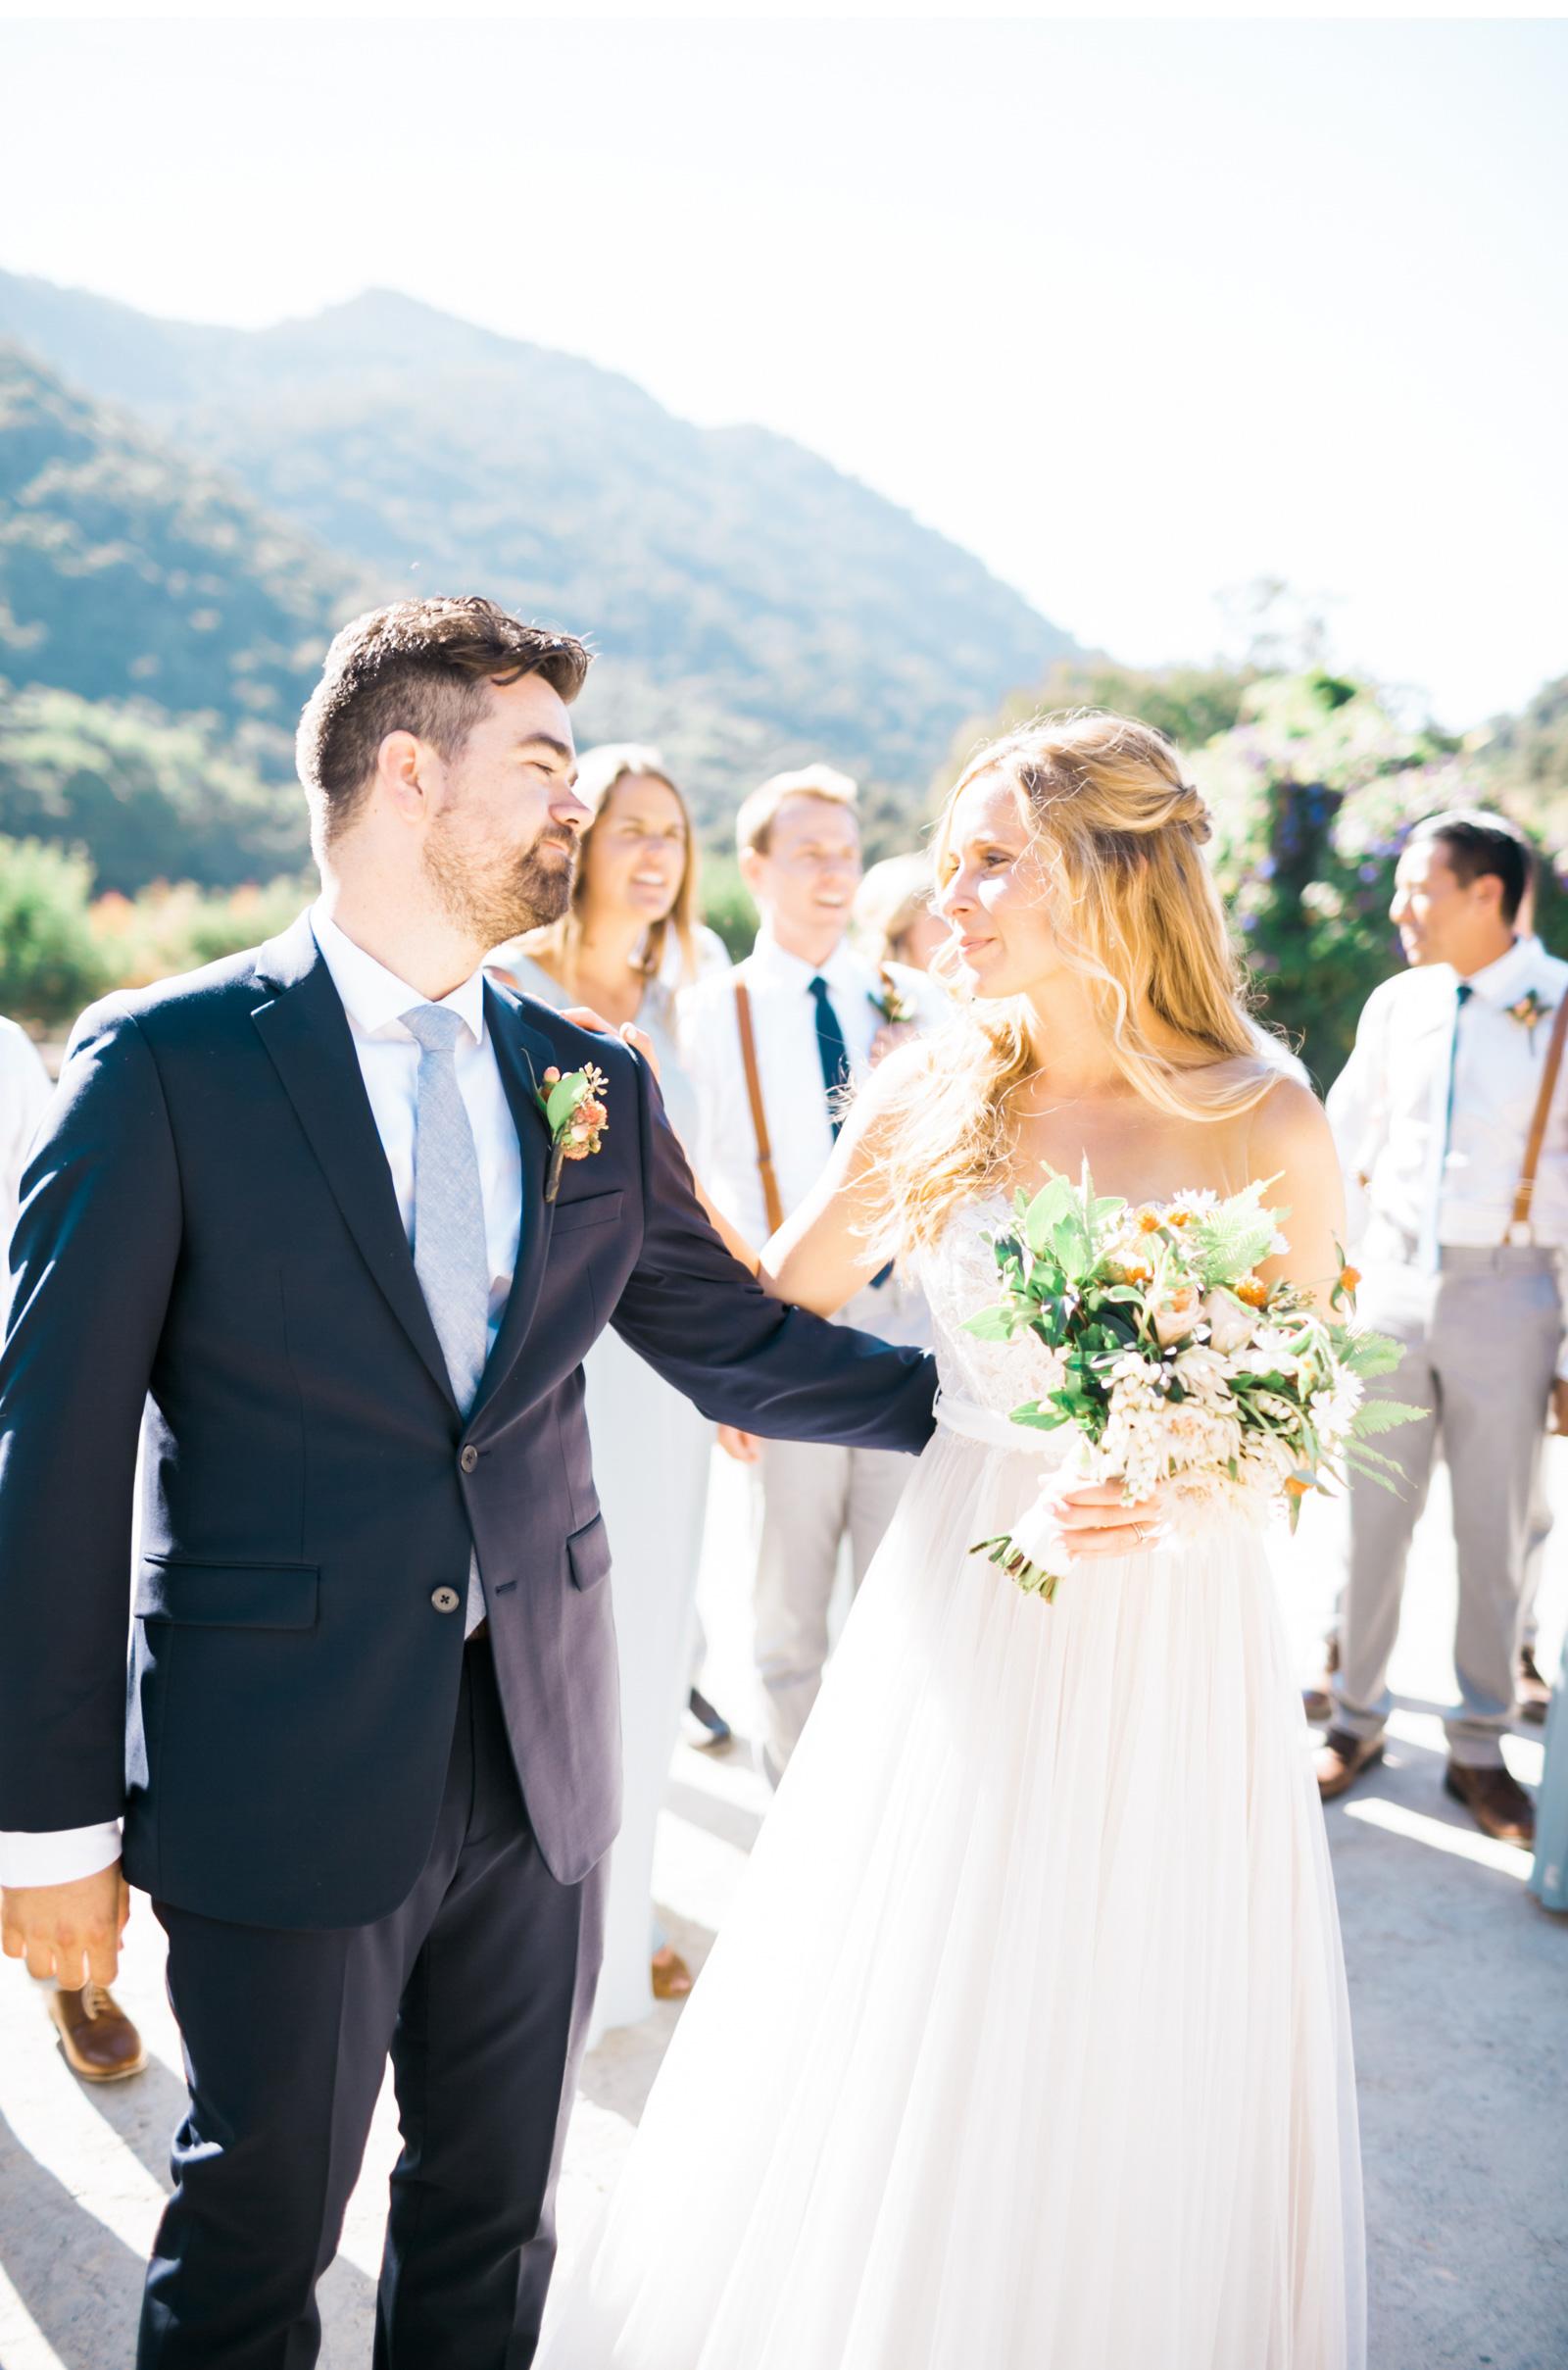 Style-Me-Pretty-San-Luis-Obispo-Wedding-Natalie-Schutt-Photography_17.jpg